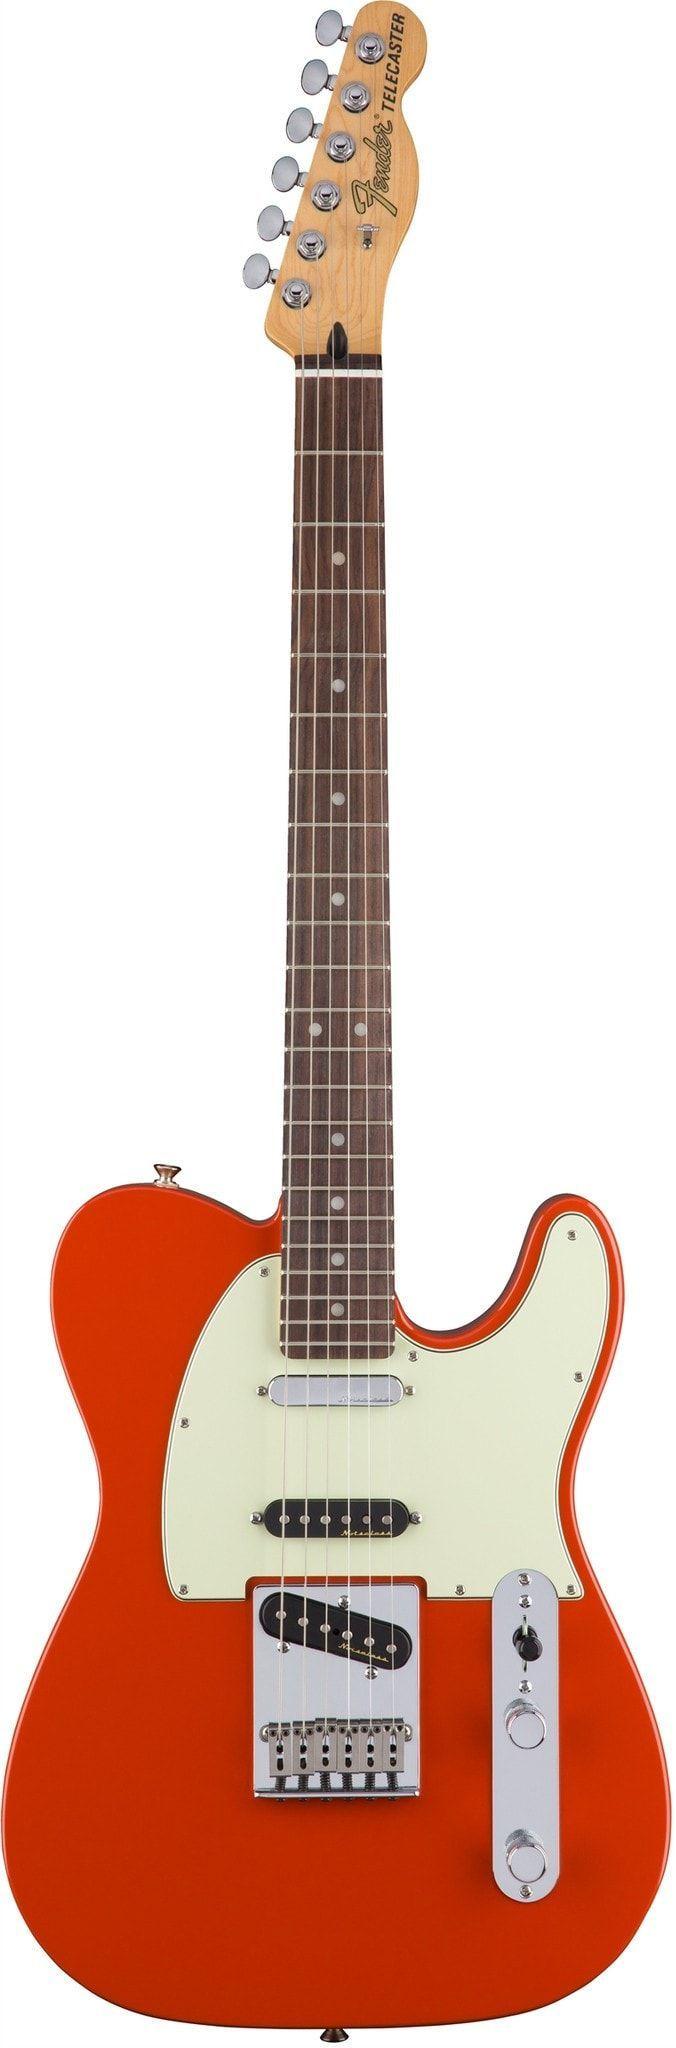 Best 25+ Fender electric guitar ideas on Pinterest | Beautiful ...